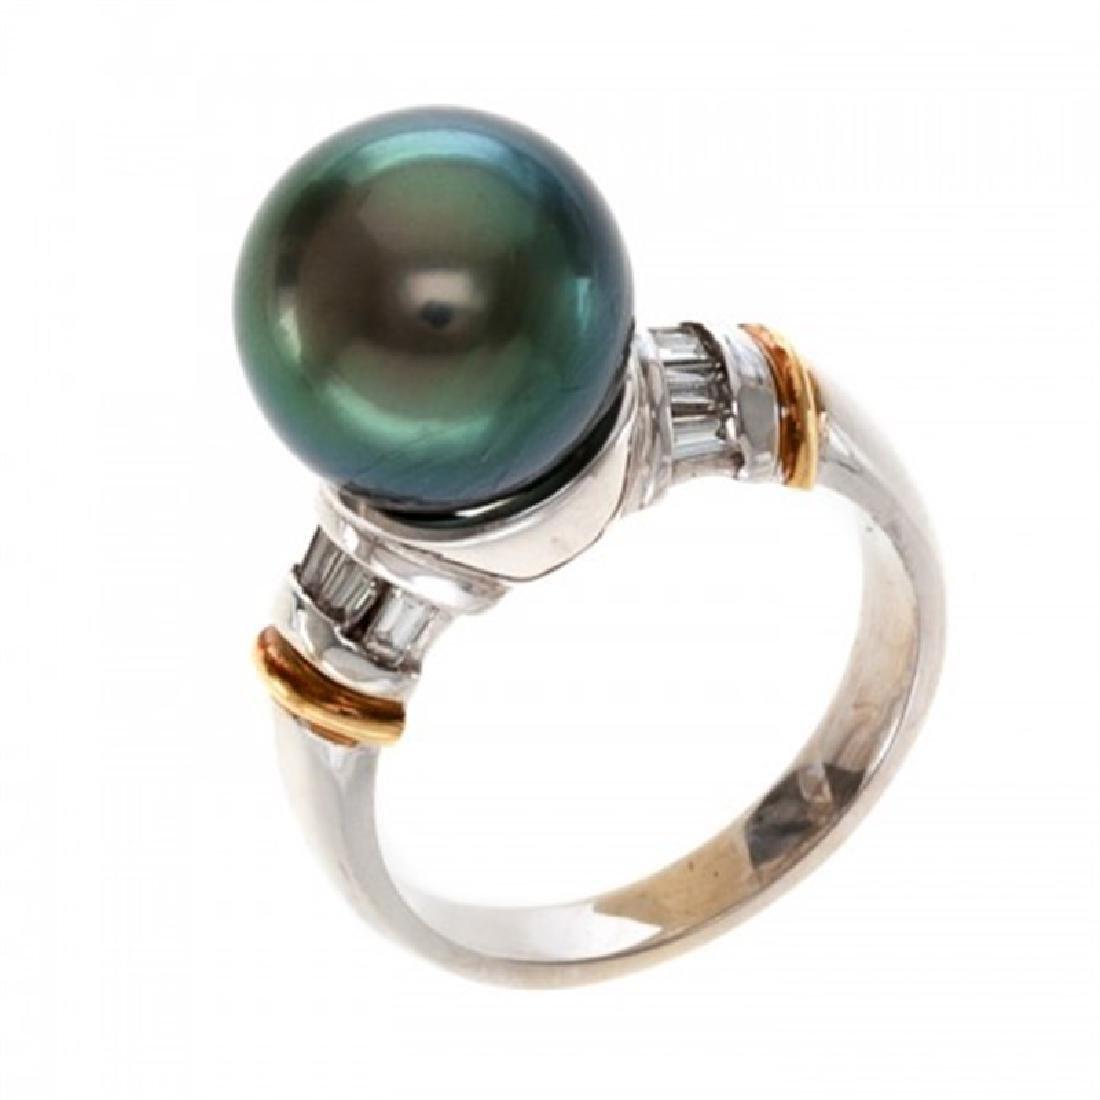 11.0-11.5mm Tahitian Black Pearl Ring with Diamonds